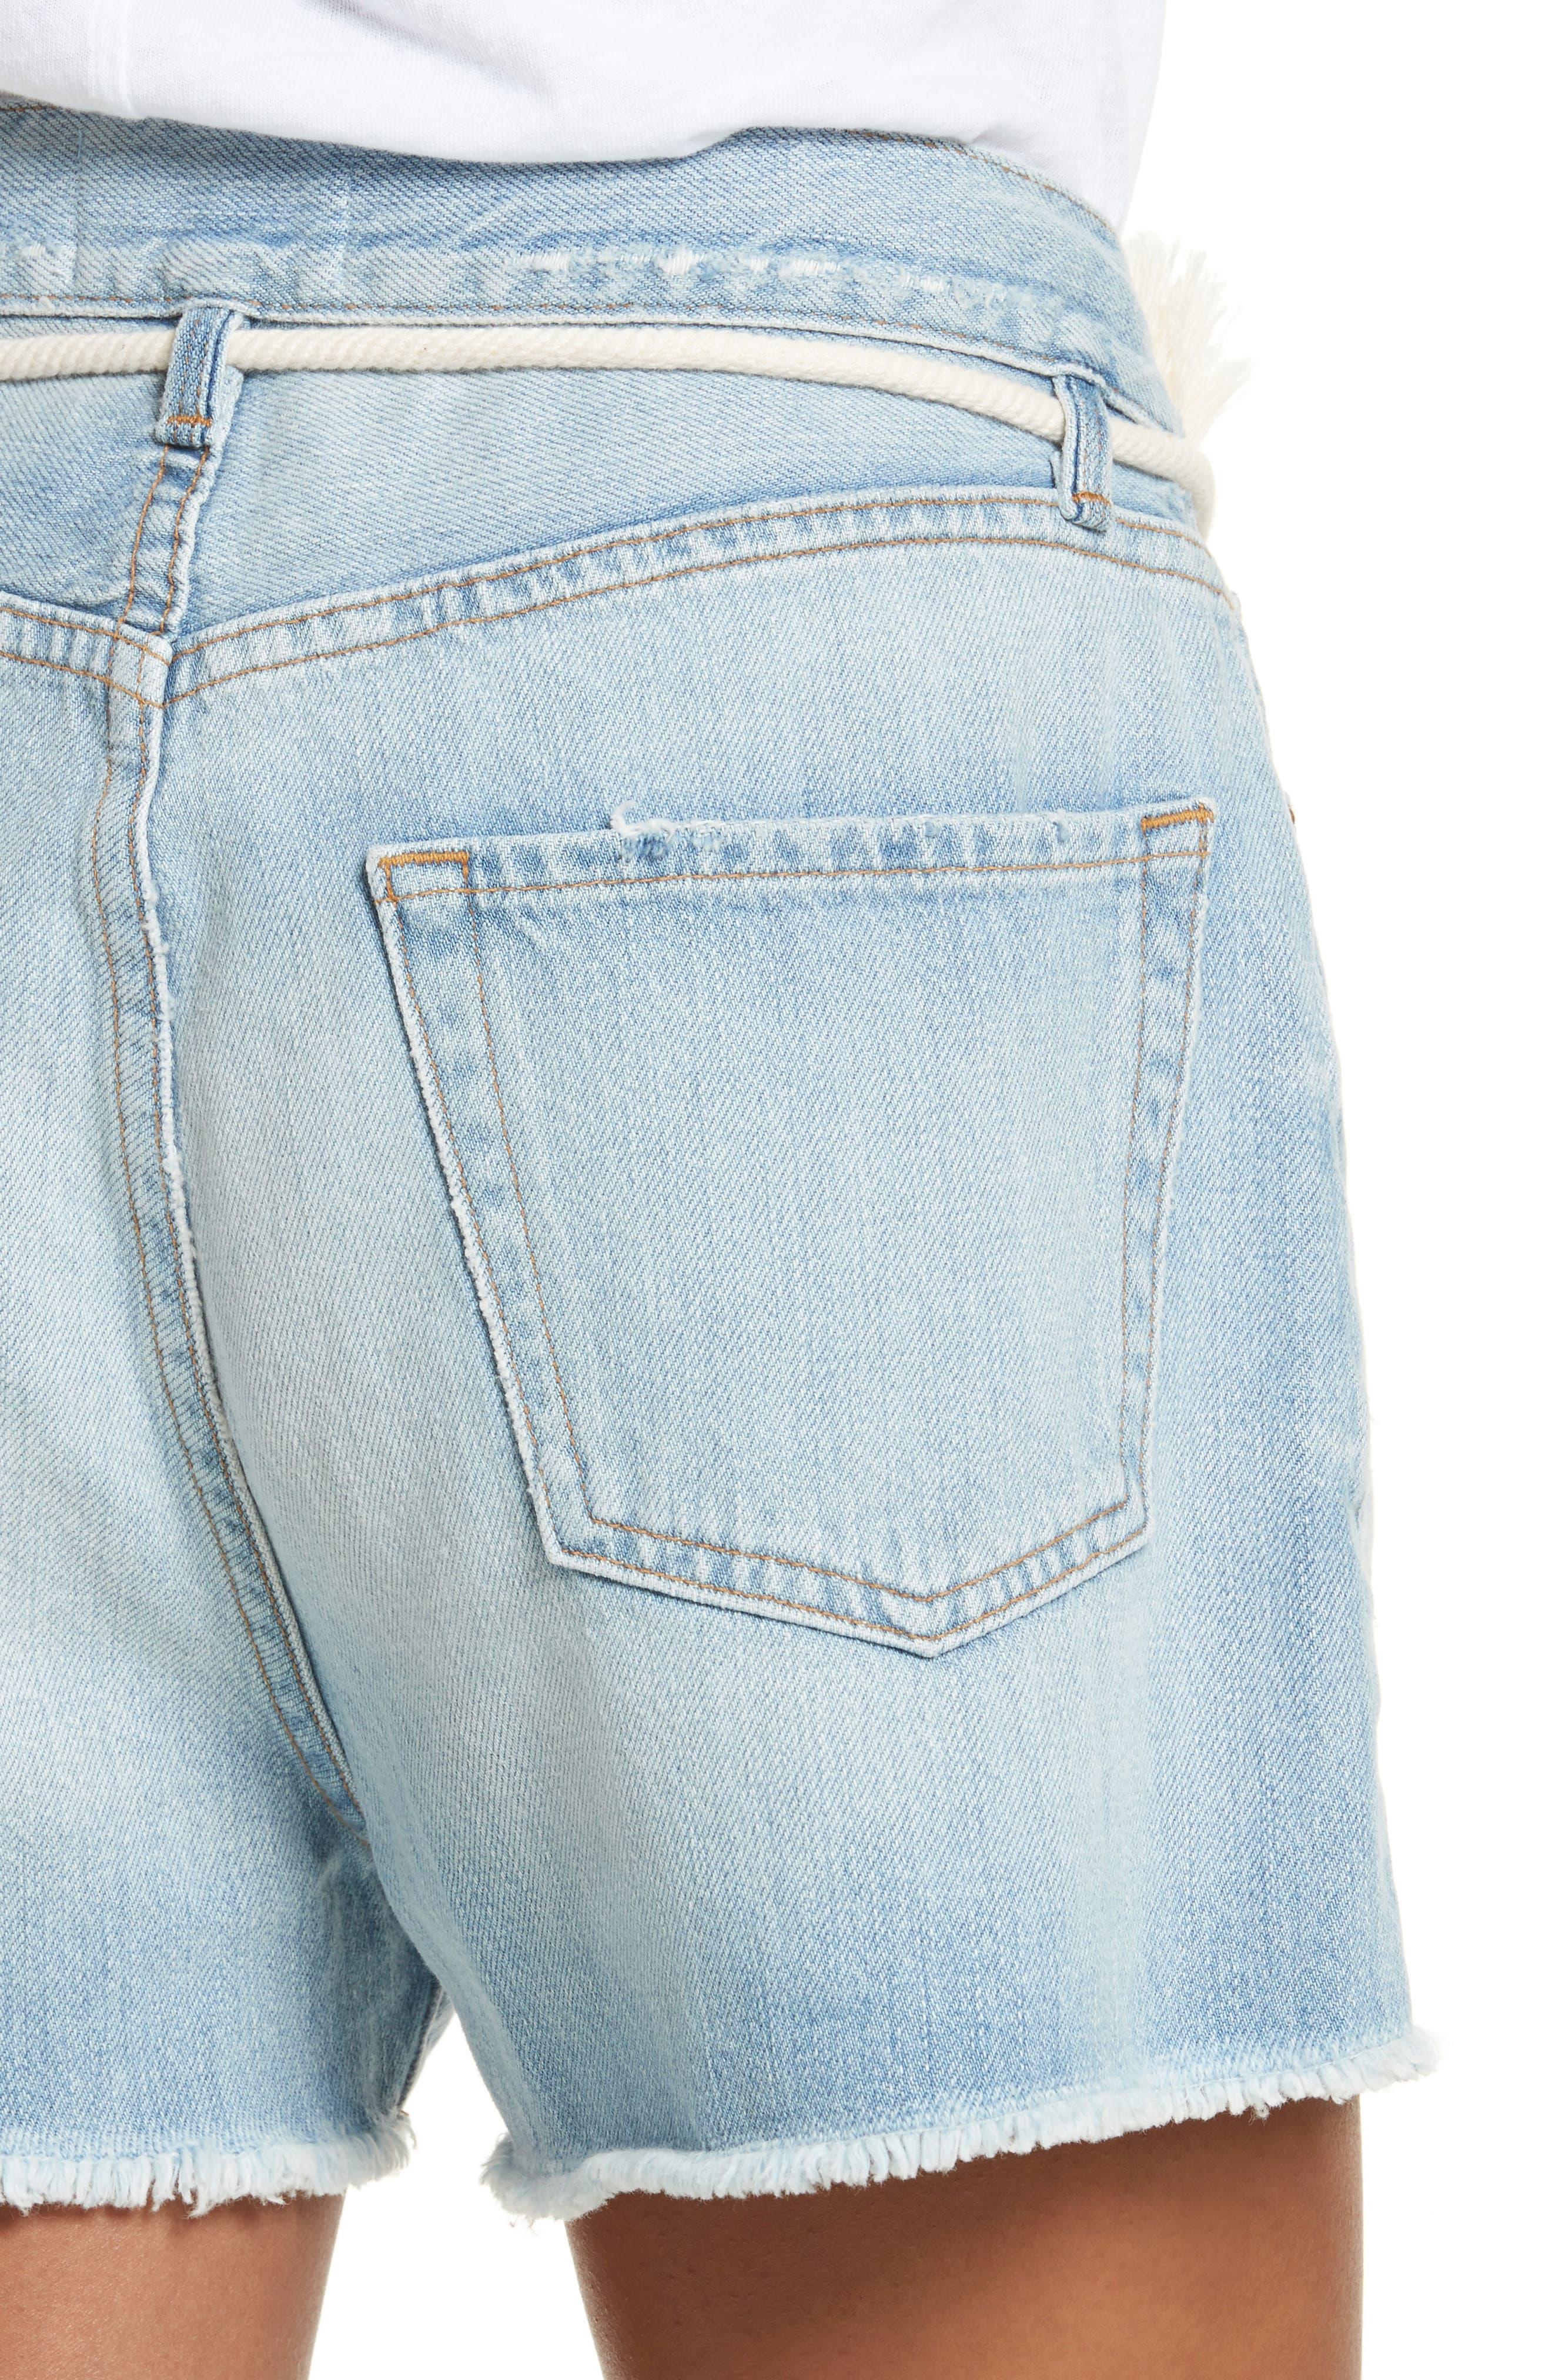 Cutoff Denim Shorts,                             Alternate thumbnail 5, color,                             Gregory Way